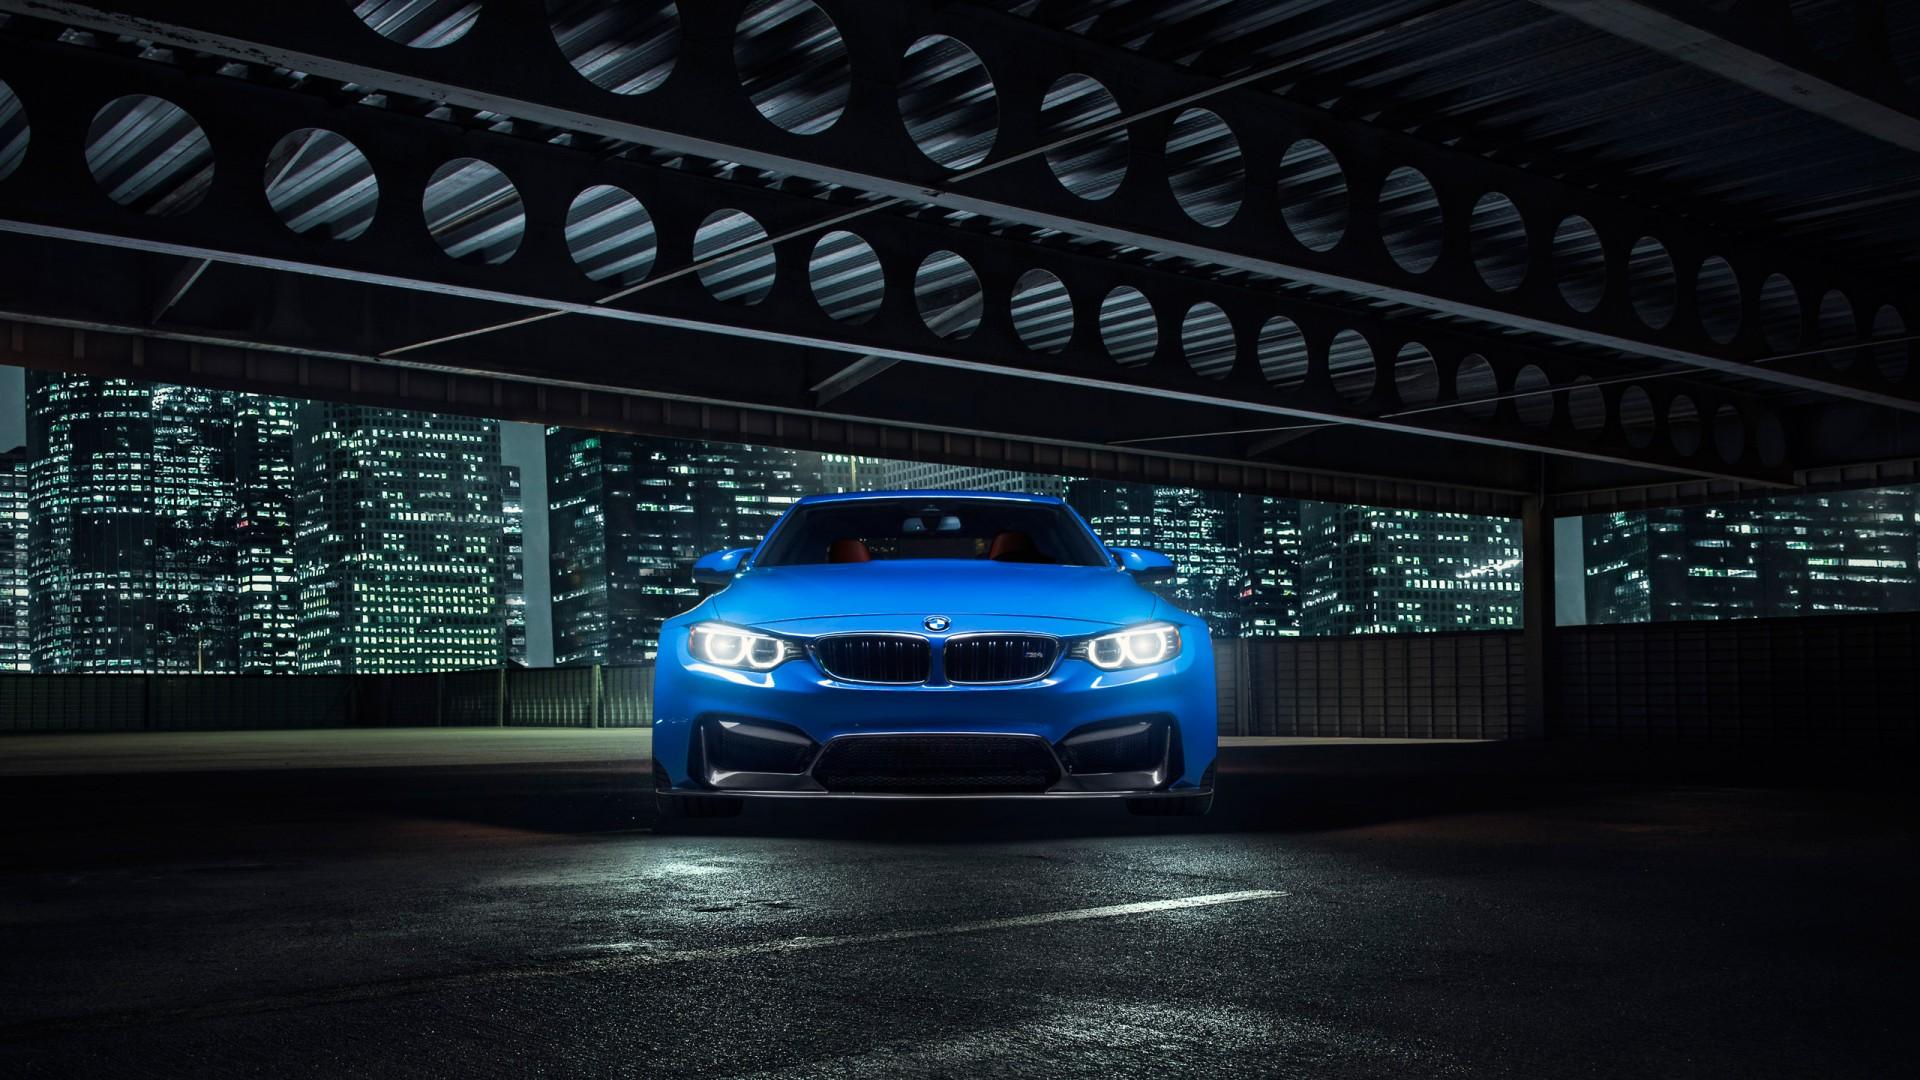 Hd Wallpapers Laptop Cars 2015 Vorsteiner Bmw Yas Marina Blue Gtrs4 Anniversary